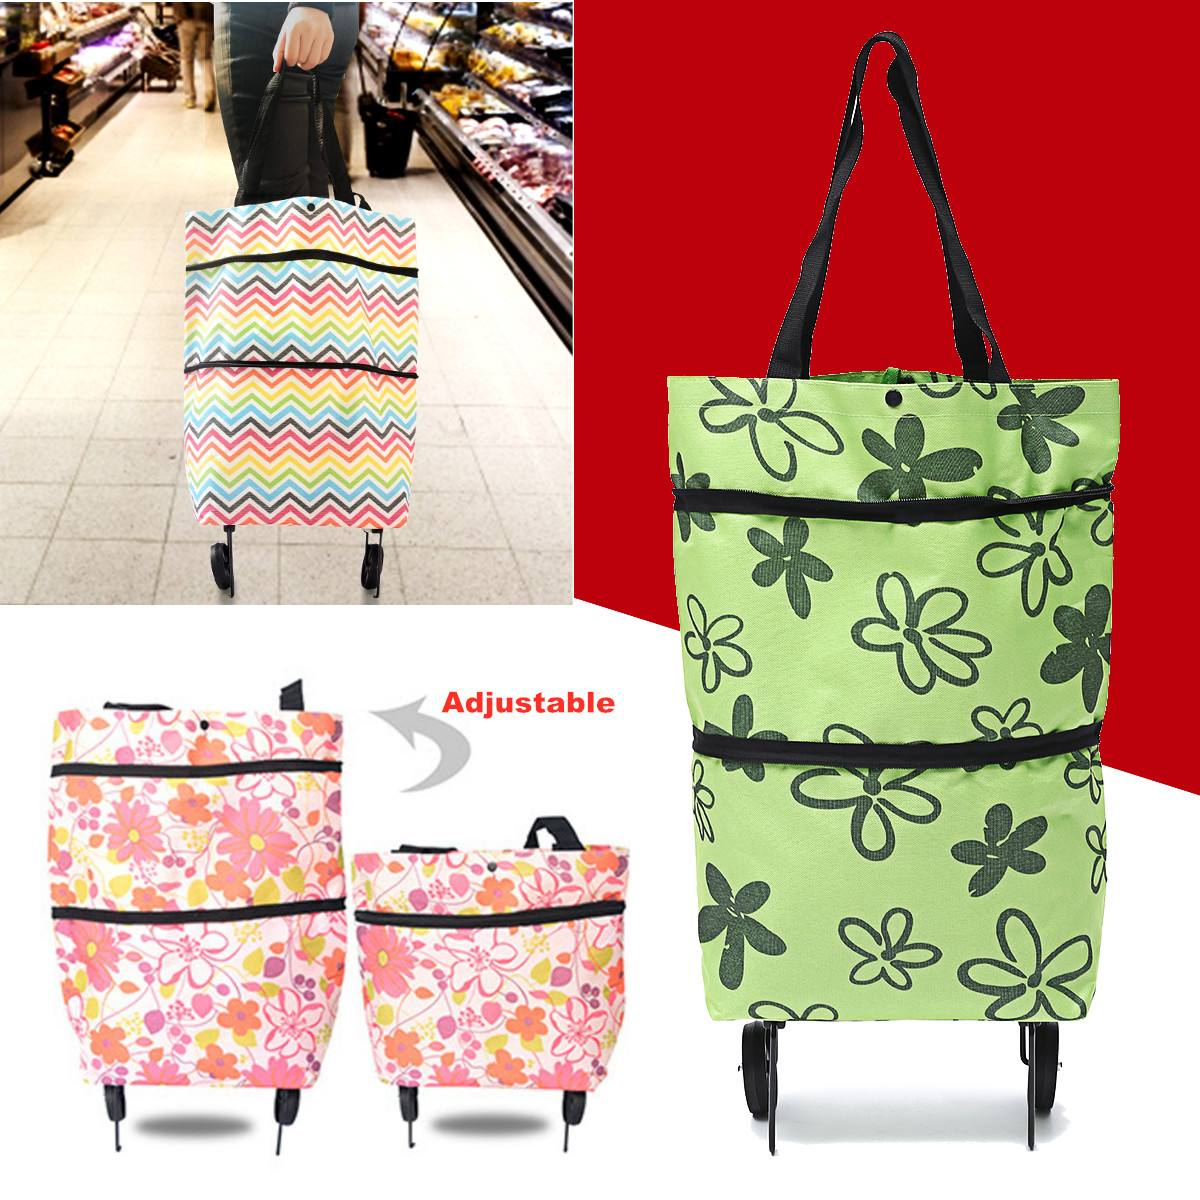 ADGAI Colorful Fairy Paint Canvas Travel Weekender Bag,Fashion Custom Lightweight Large Capacity Portable Luggage Bag,Suitcase Trolley Bag